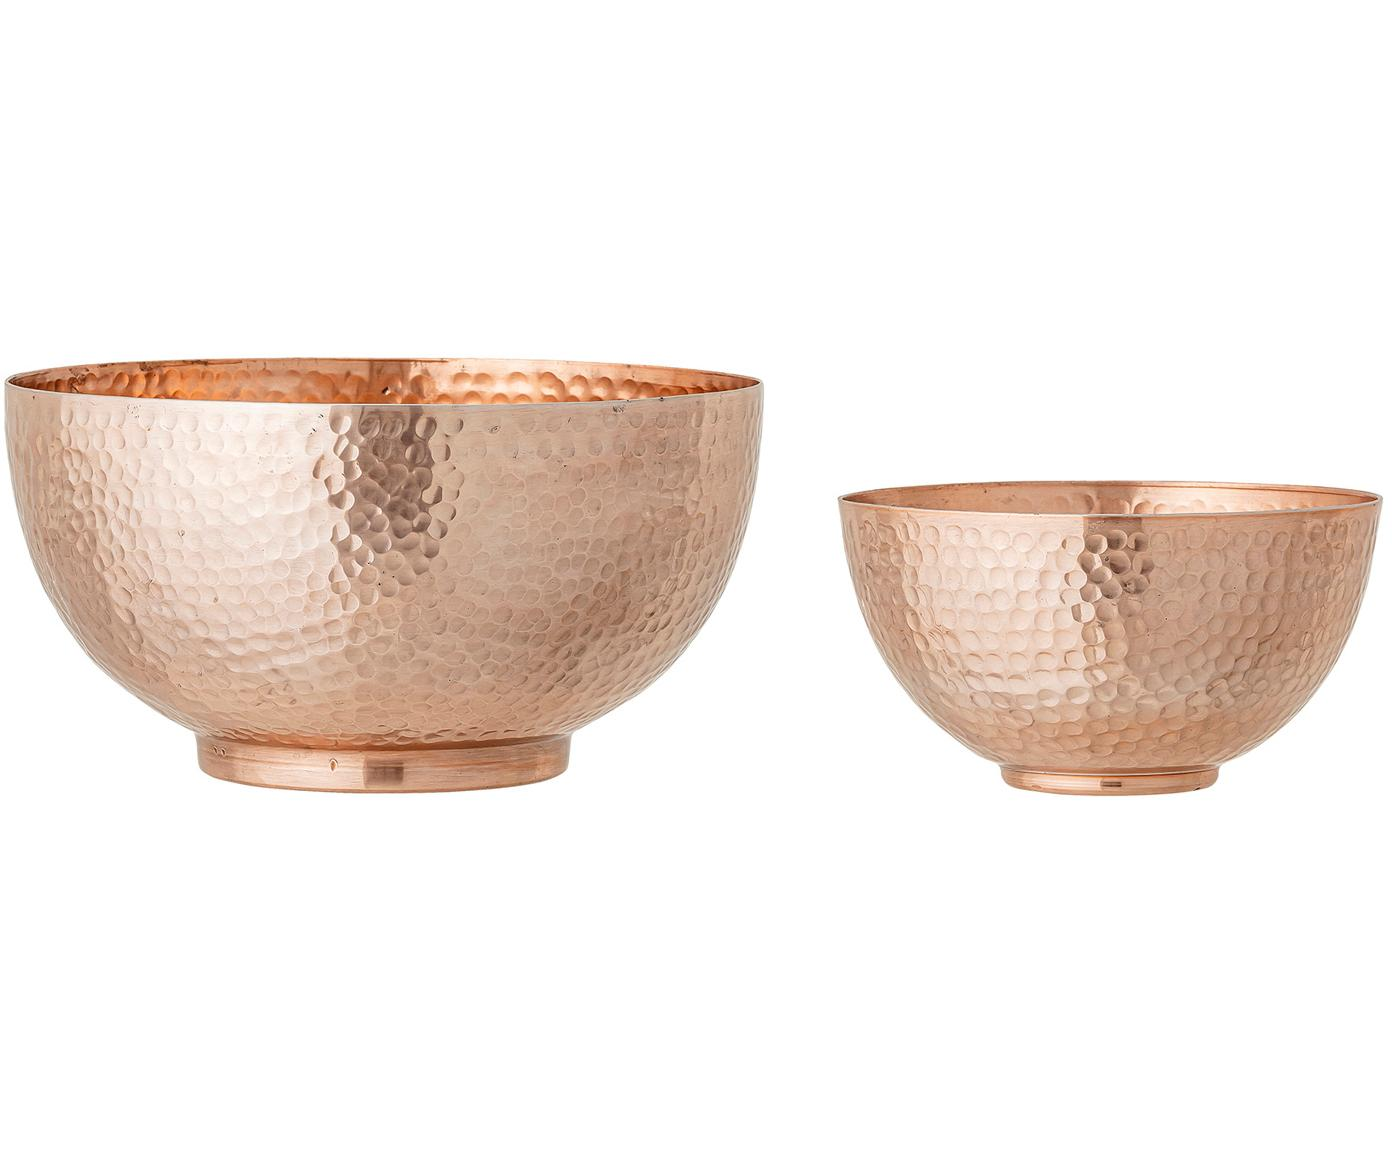 Schalen-Set Cedar in Kupfer, 2 Stück, Aluminium, beschichtet, Kupferfarben, Sondergrößen